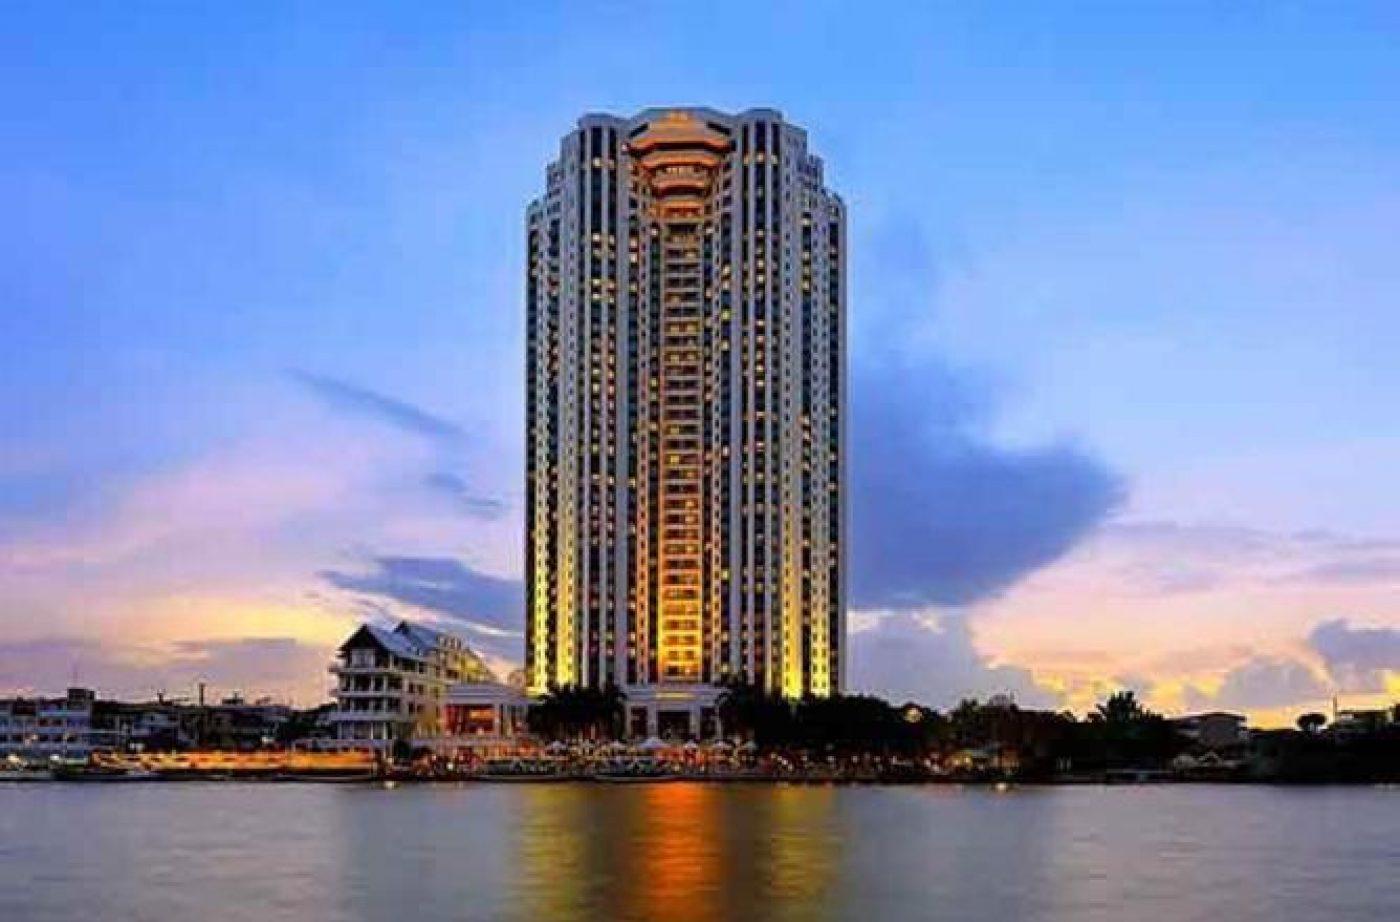 Hotels In Chicago >> The Peninsula Bangkok - Mason Rose